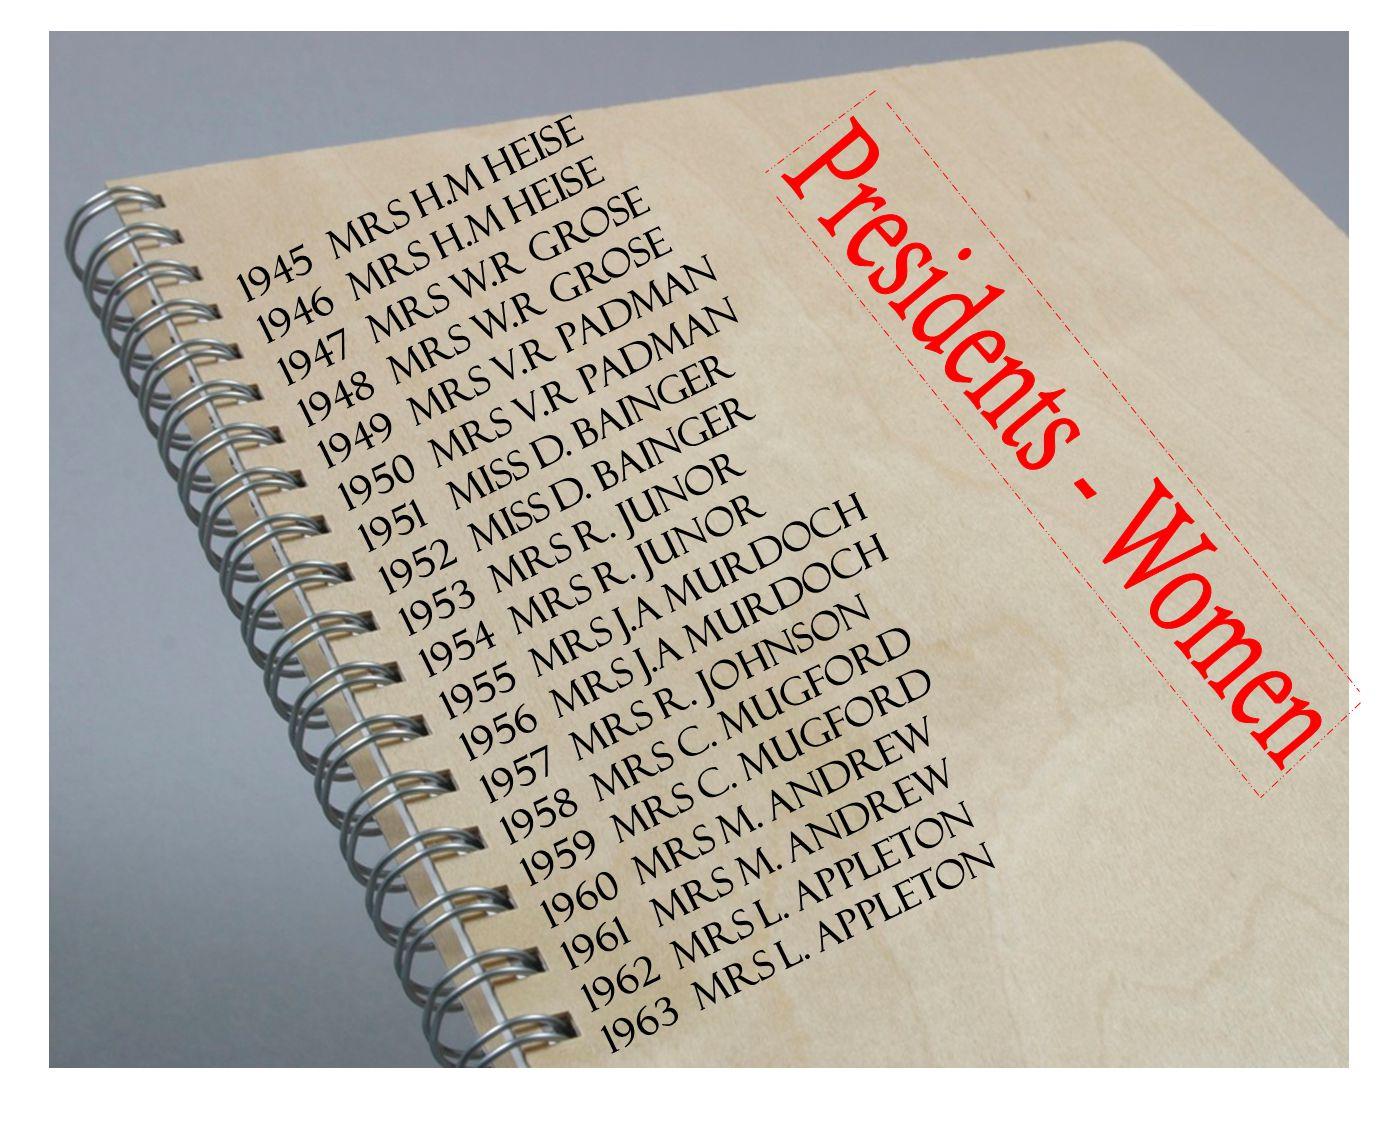 1946 MRS H.M HEISE 1947 MRS W.R GROSE 1948 MRS W.R GROSE 1949 MRS V.R PADMAN 1950 MRS V.R PADMAN 1951 MISS D. BAINGER 1952 MISS D. BAINGER 1953 MRS R.